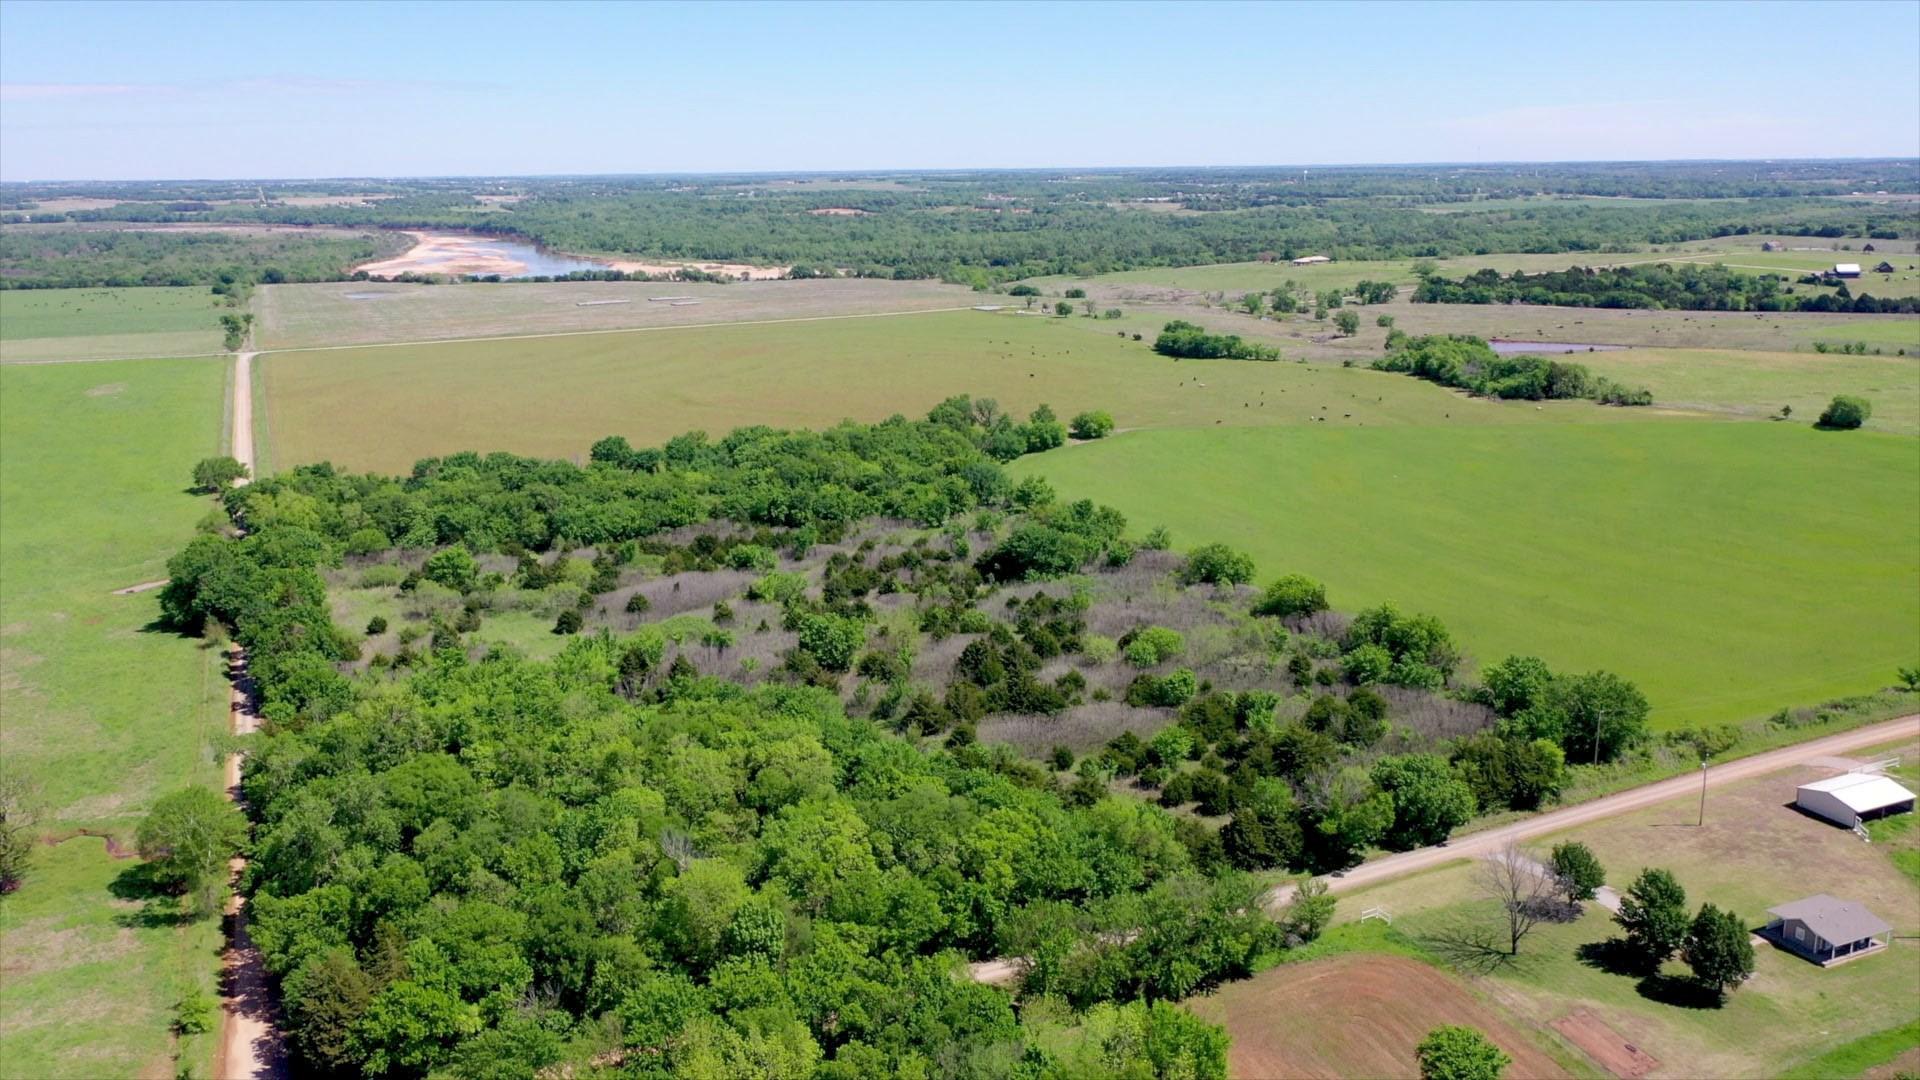 No Reserve Land Auction, Perkins OK, Jun 15 @ 6:30 p.m. Tr 3